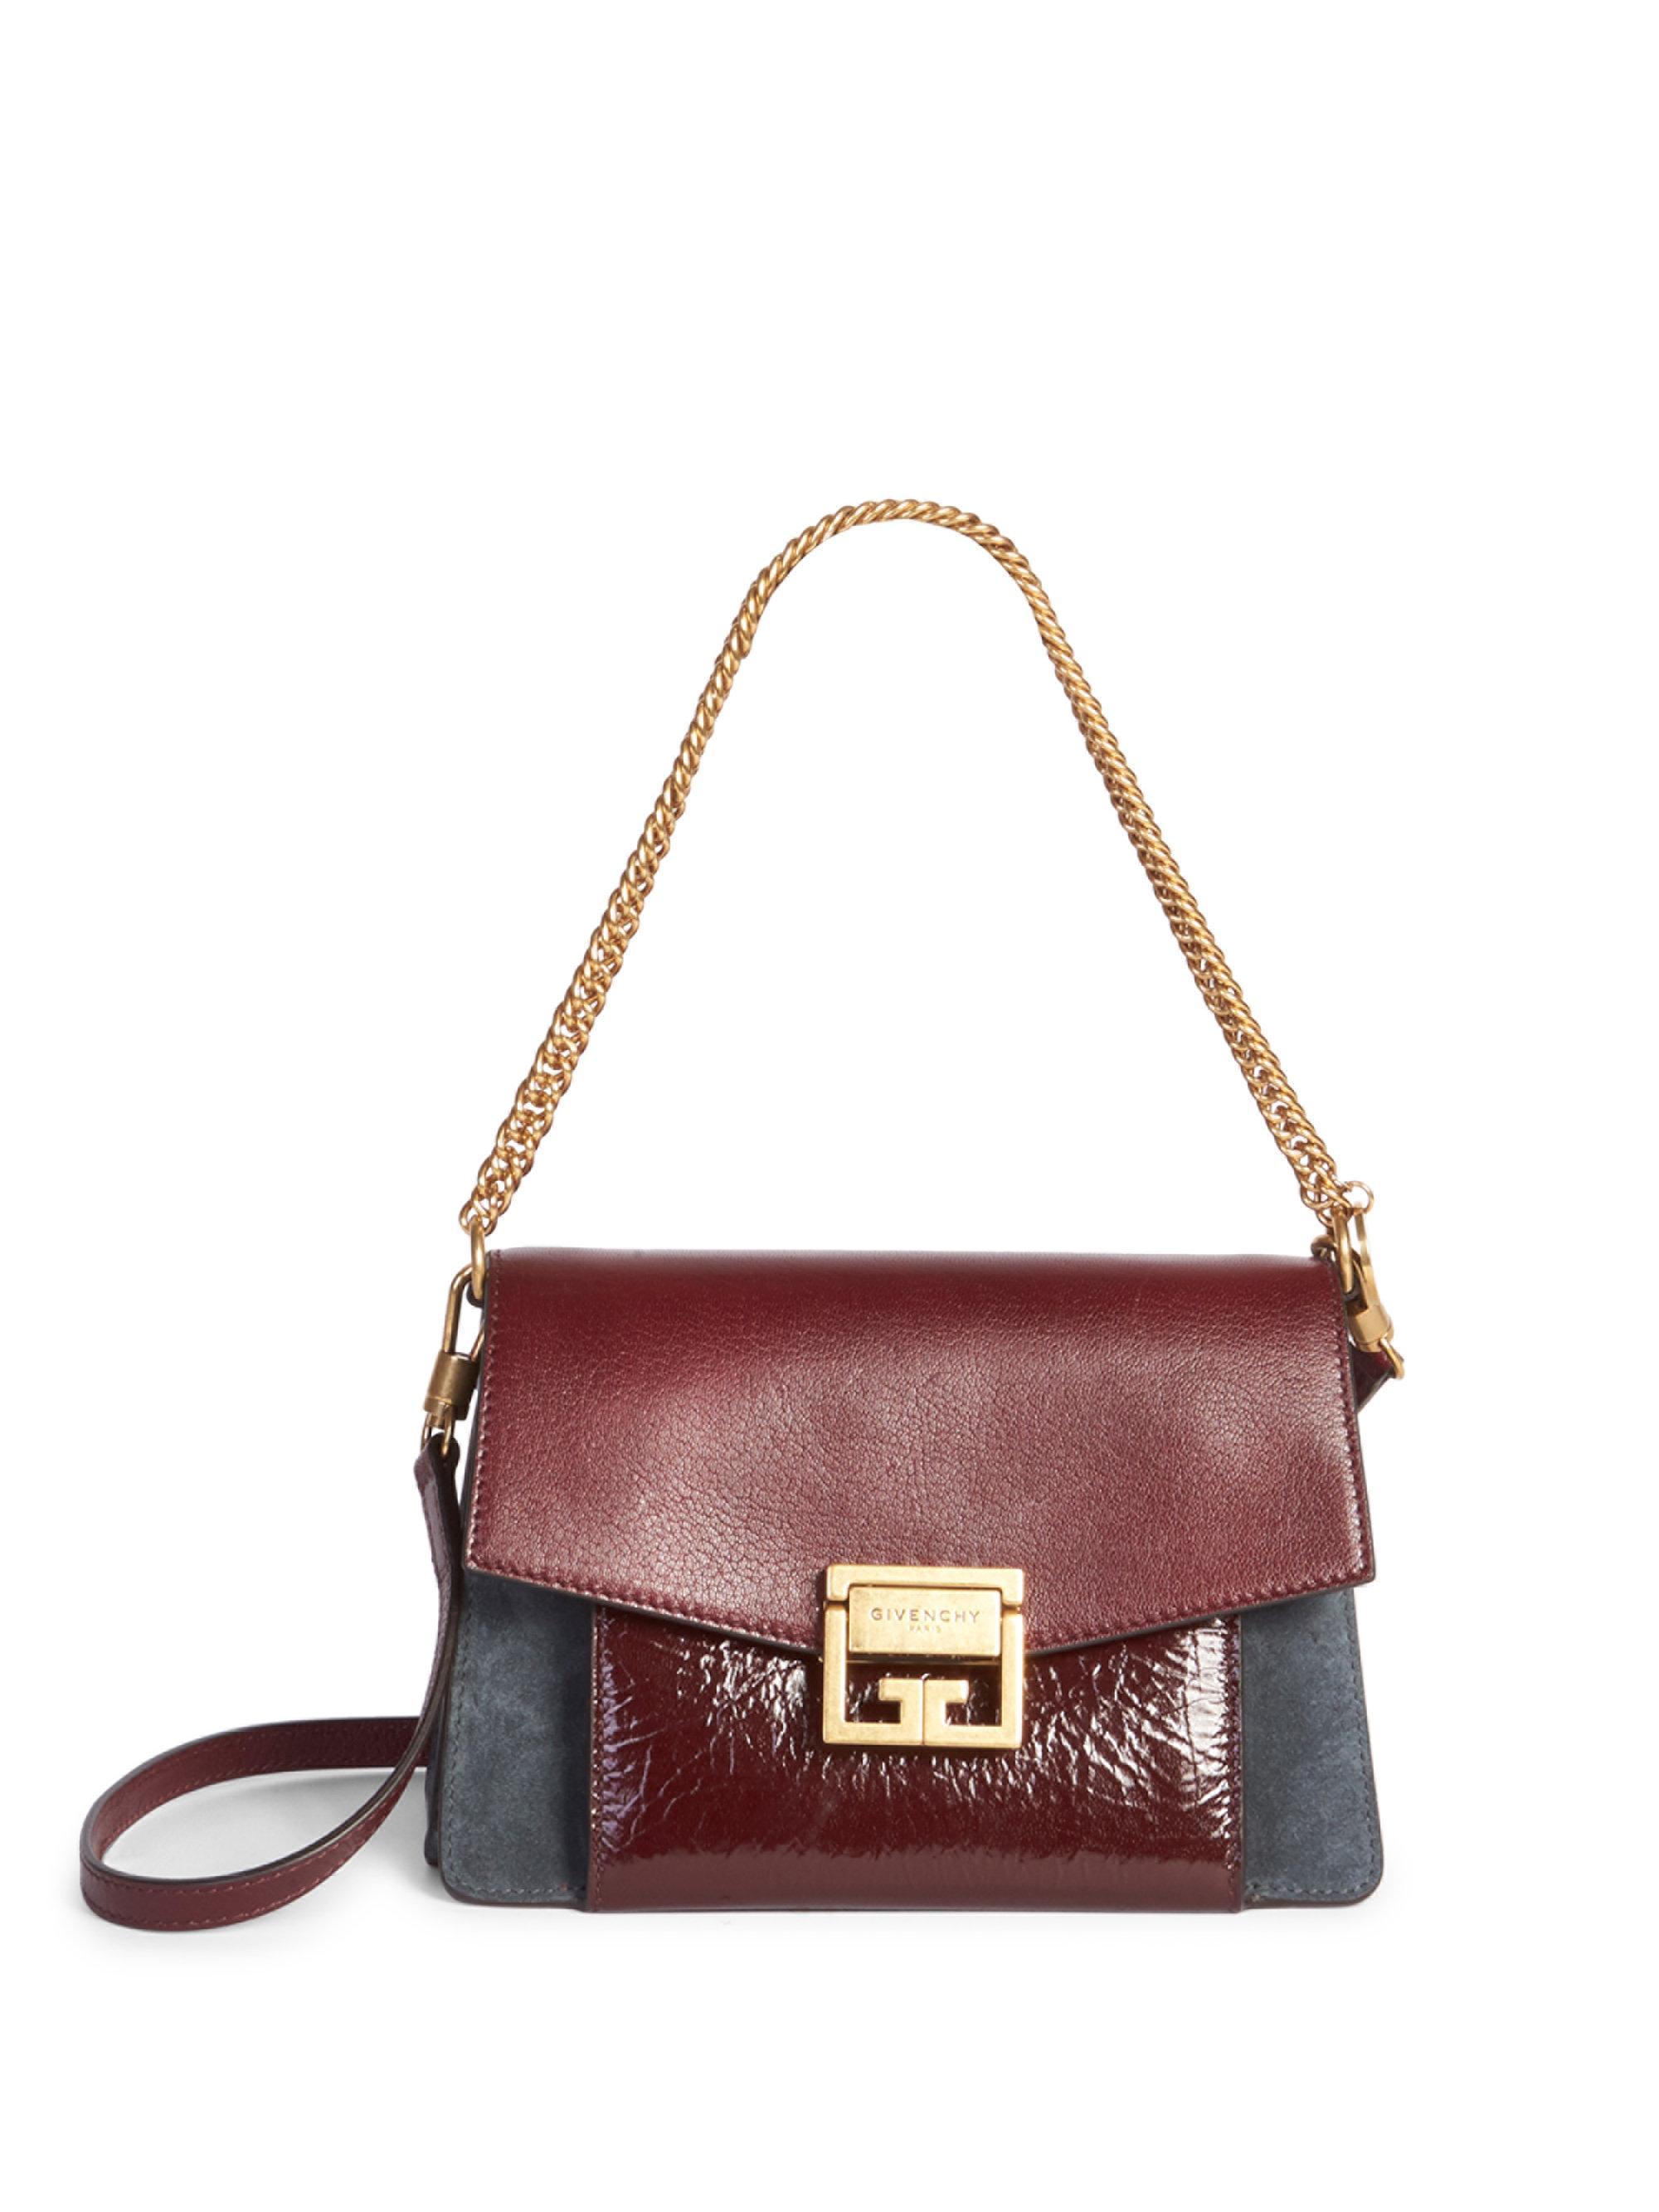 44b0d511d0fd Lyst - Givenchy Small Gv3 Crackle   Suede Aubergine Shoulder Bag